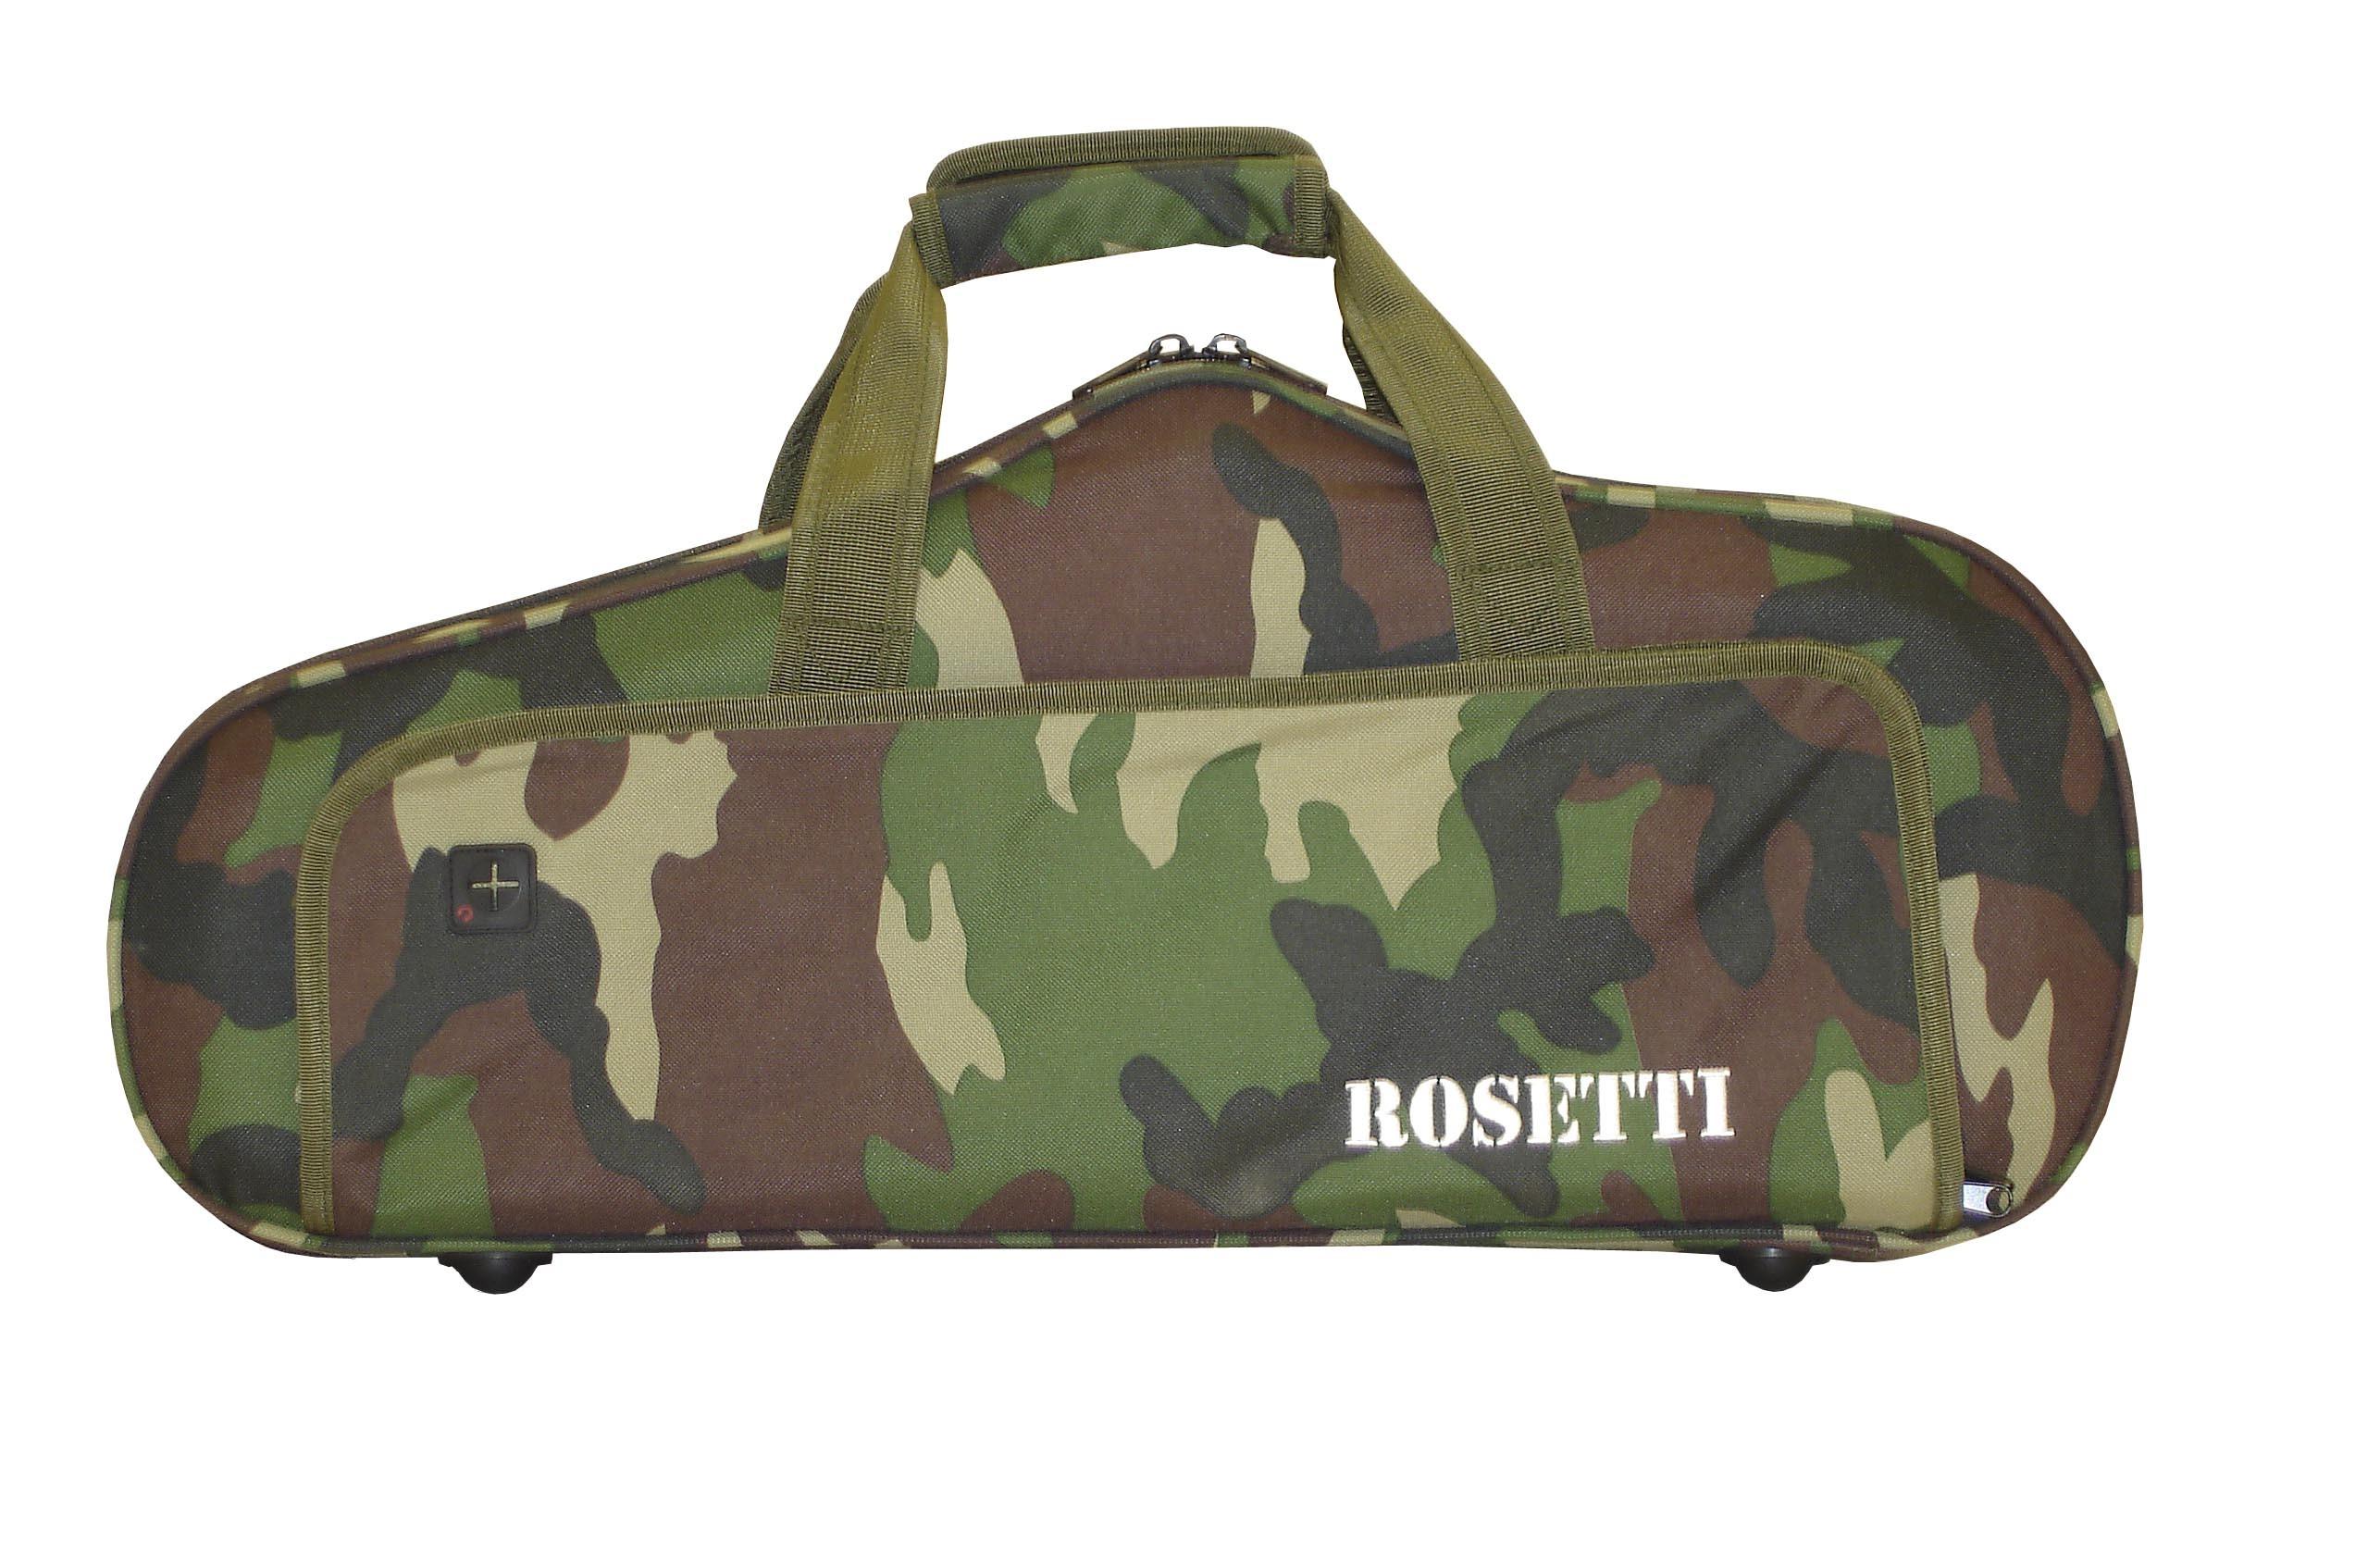 Rosetti Alto Saxophone Bag - Camo